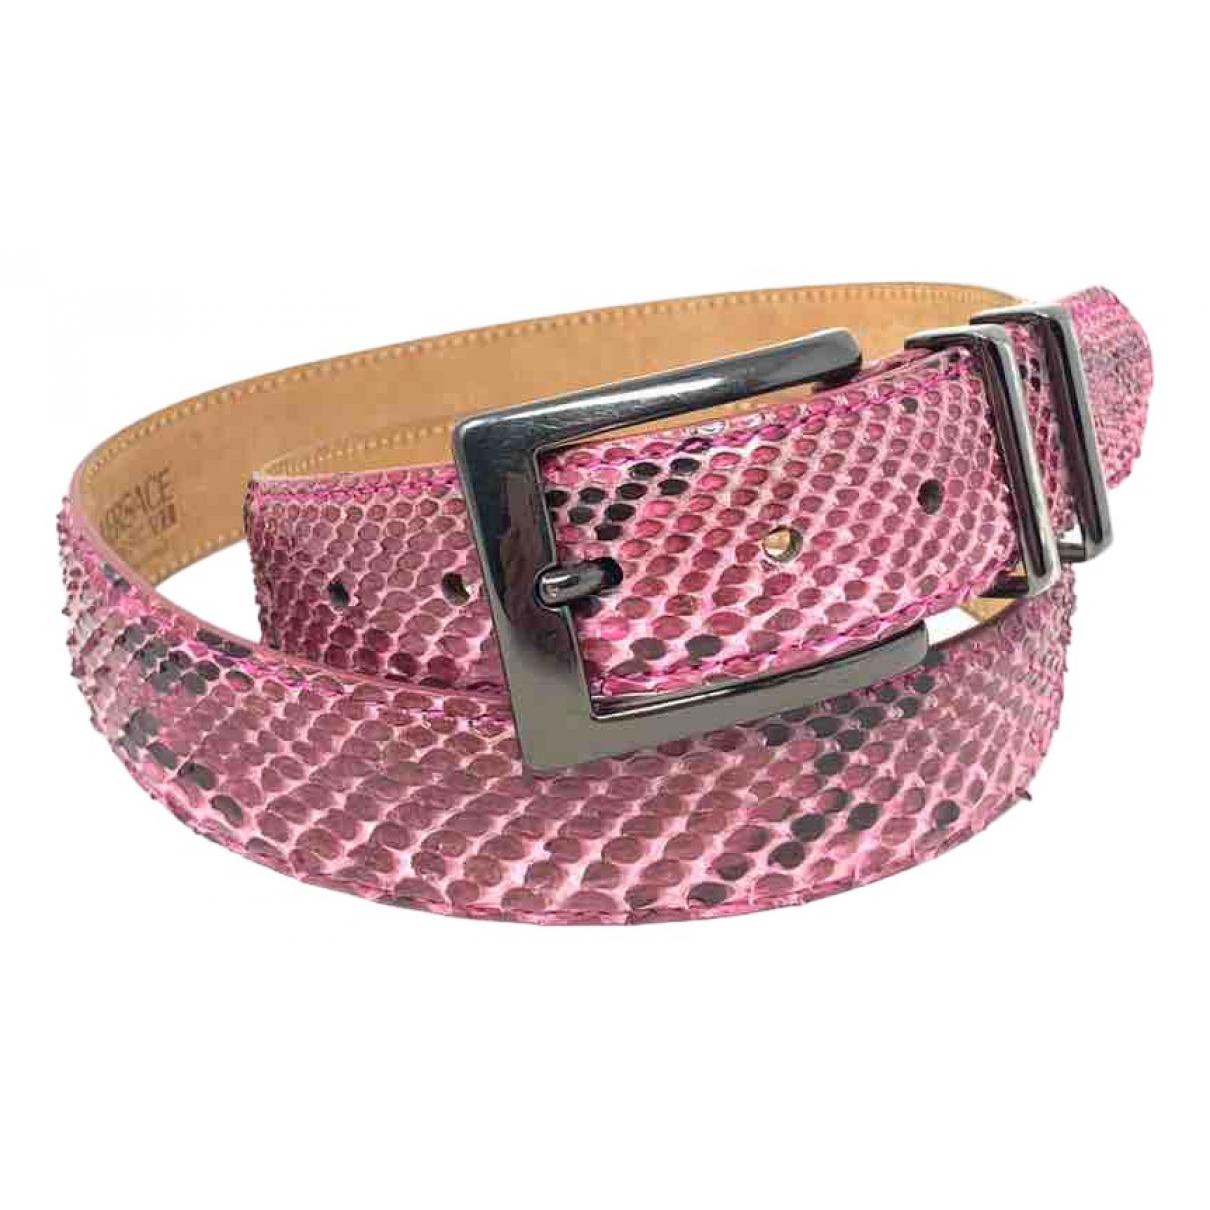 Cinturon de Piton Gianni Versace